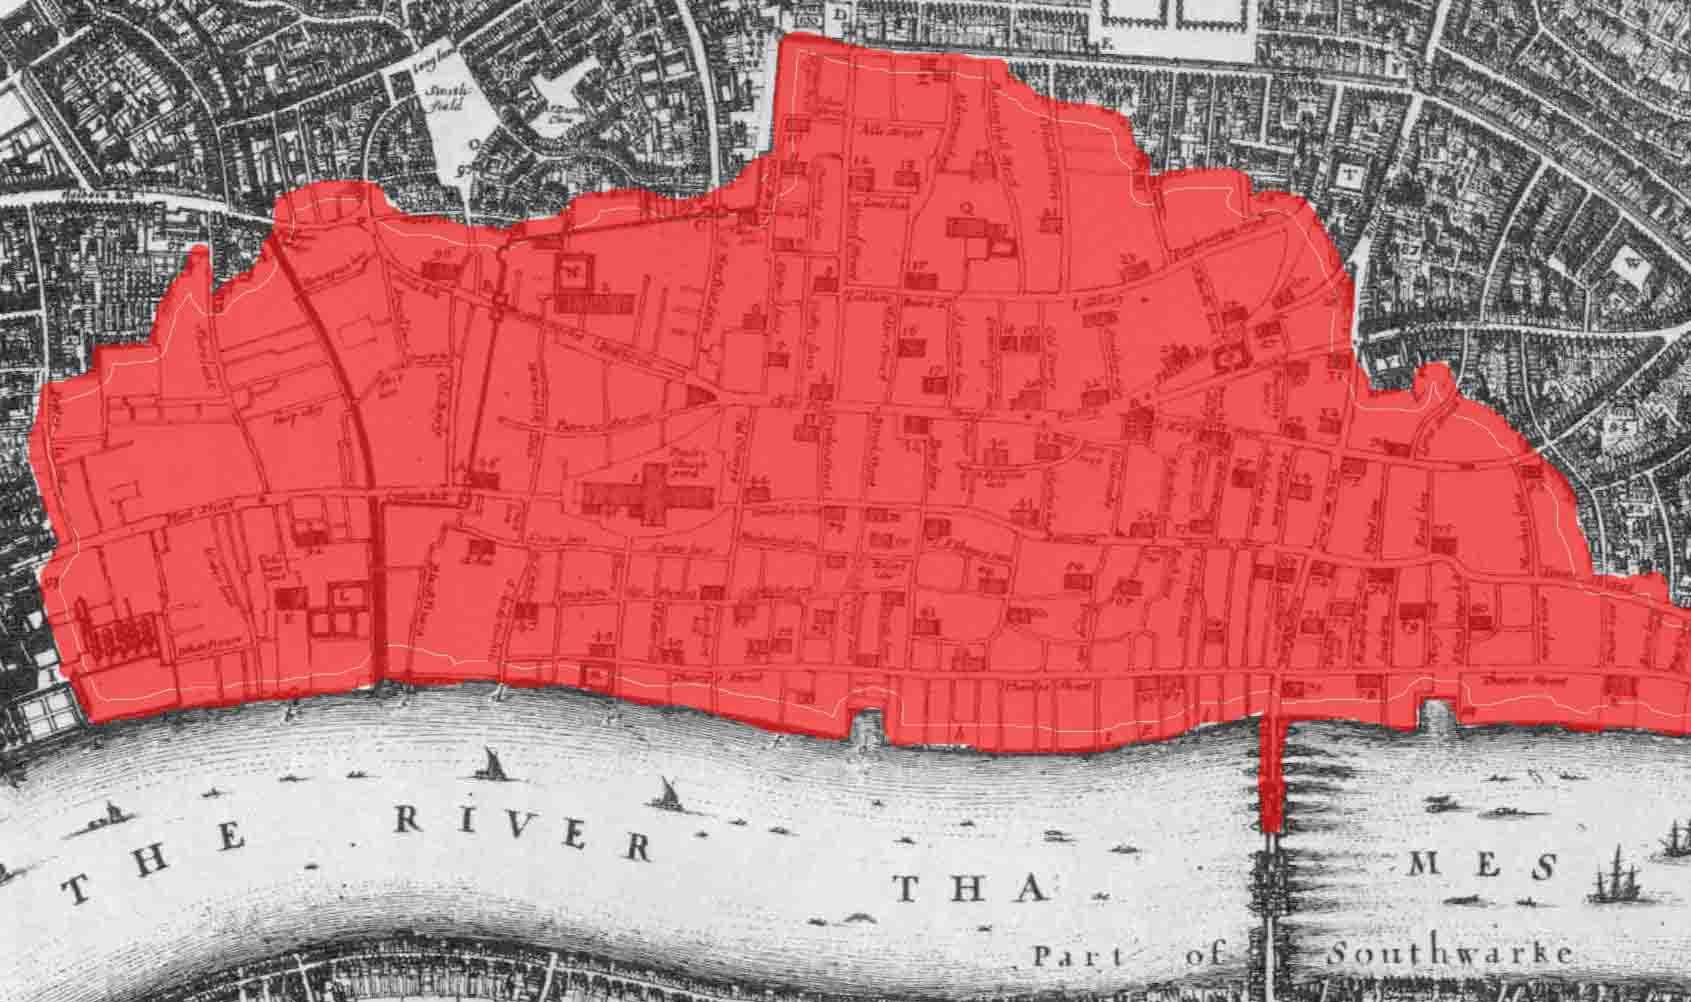 Fire of London 1666 - London Bridge -WHERE THAMES SMOOTH